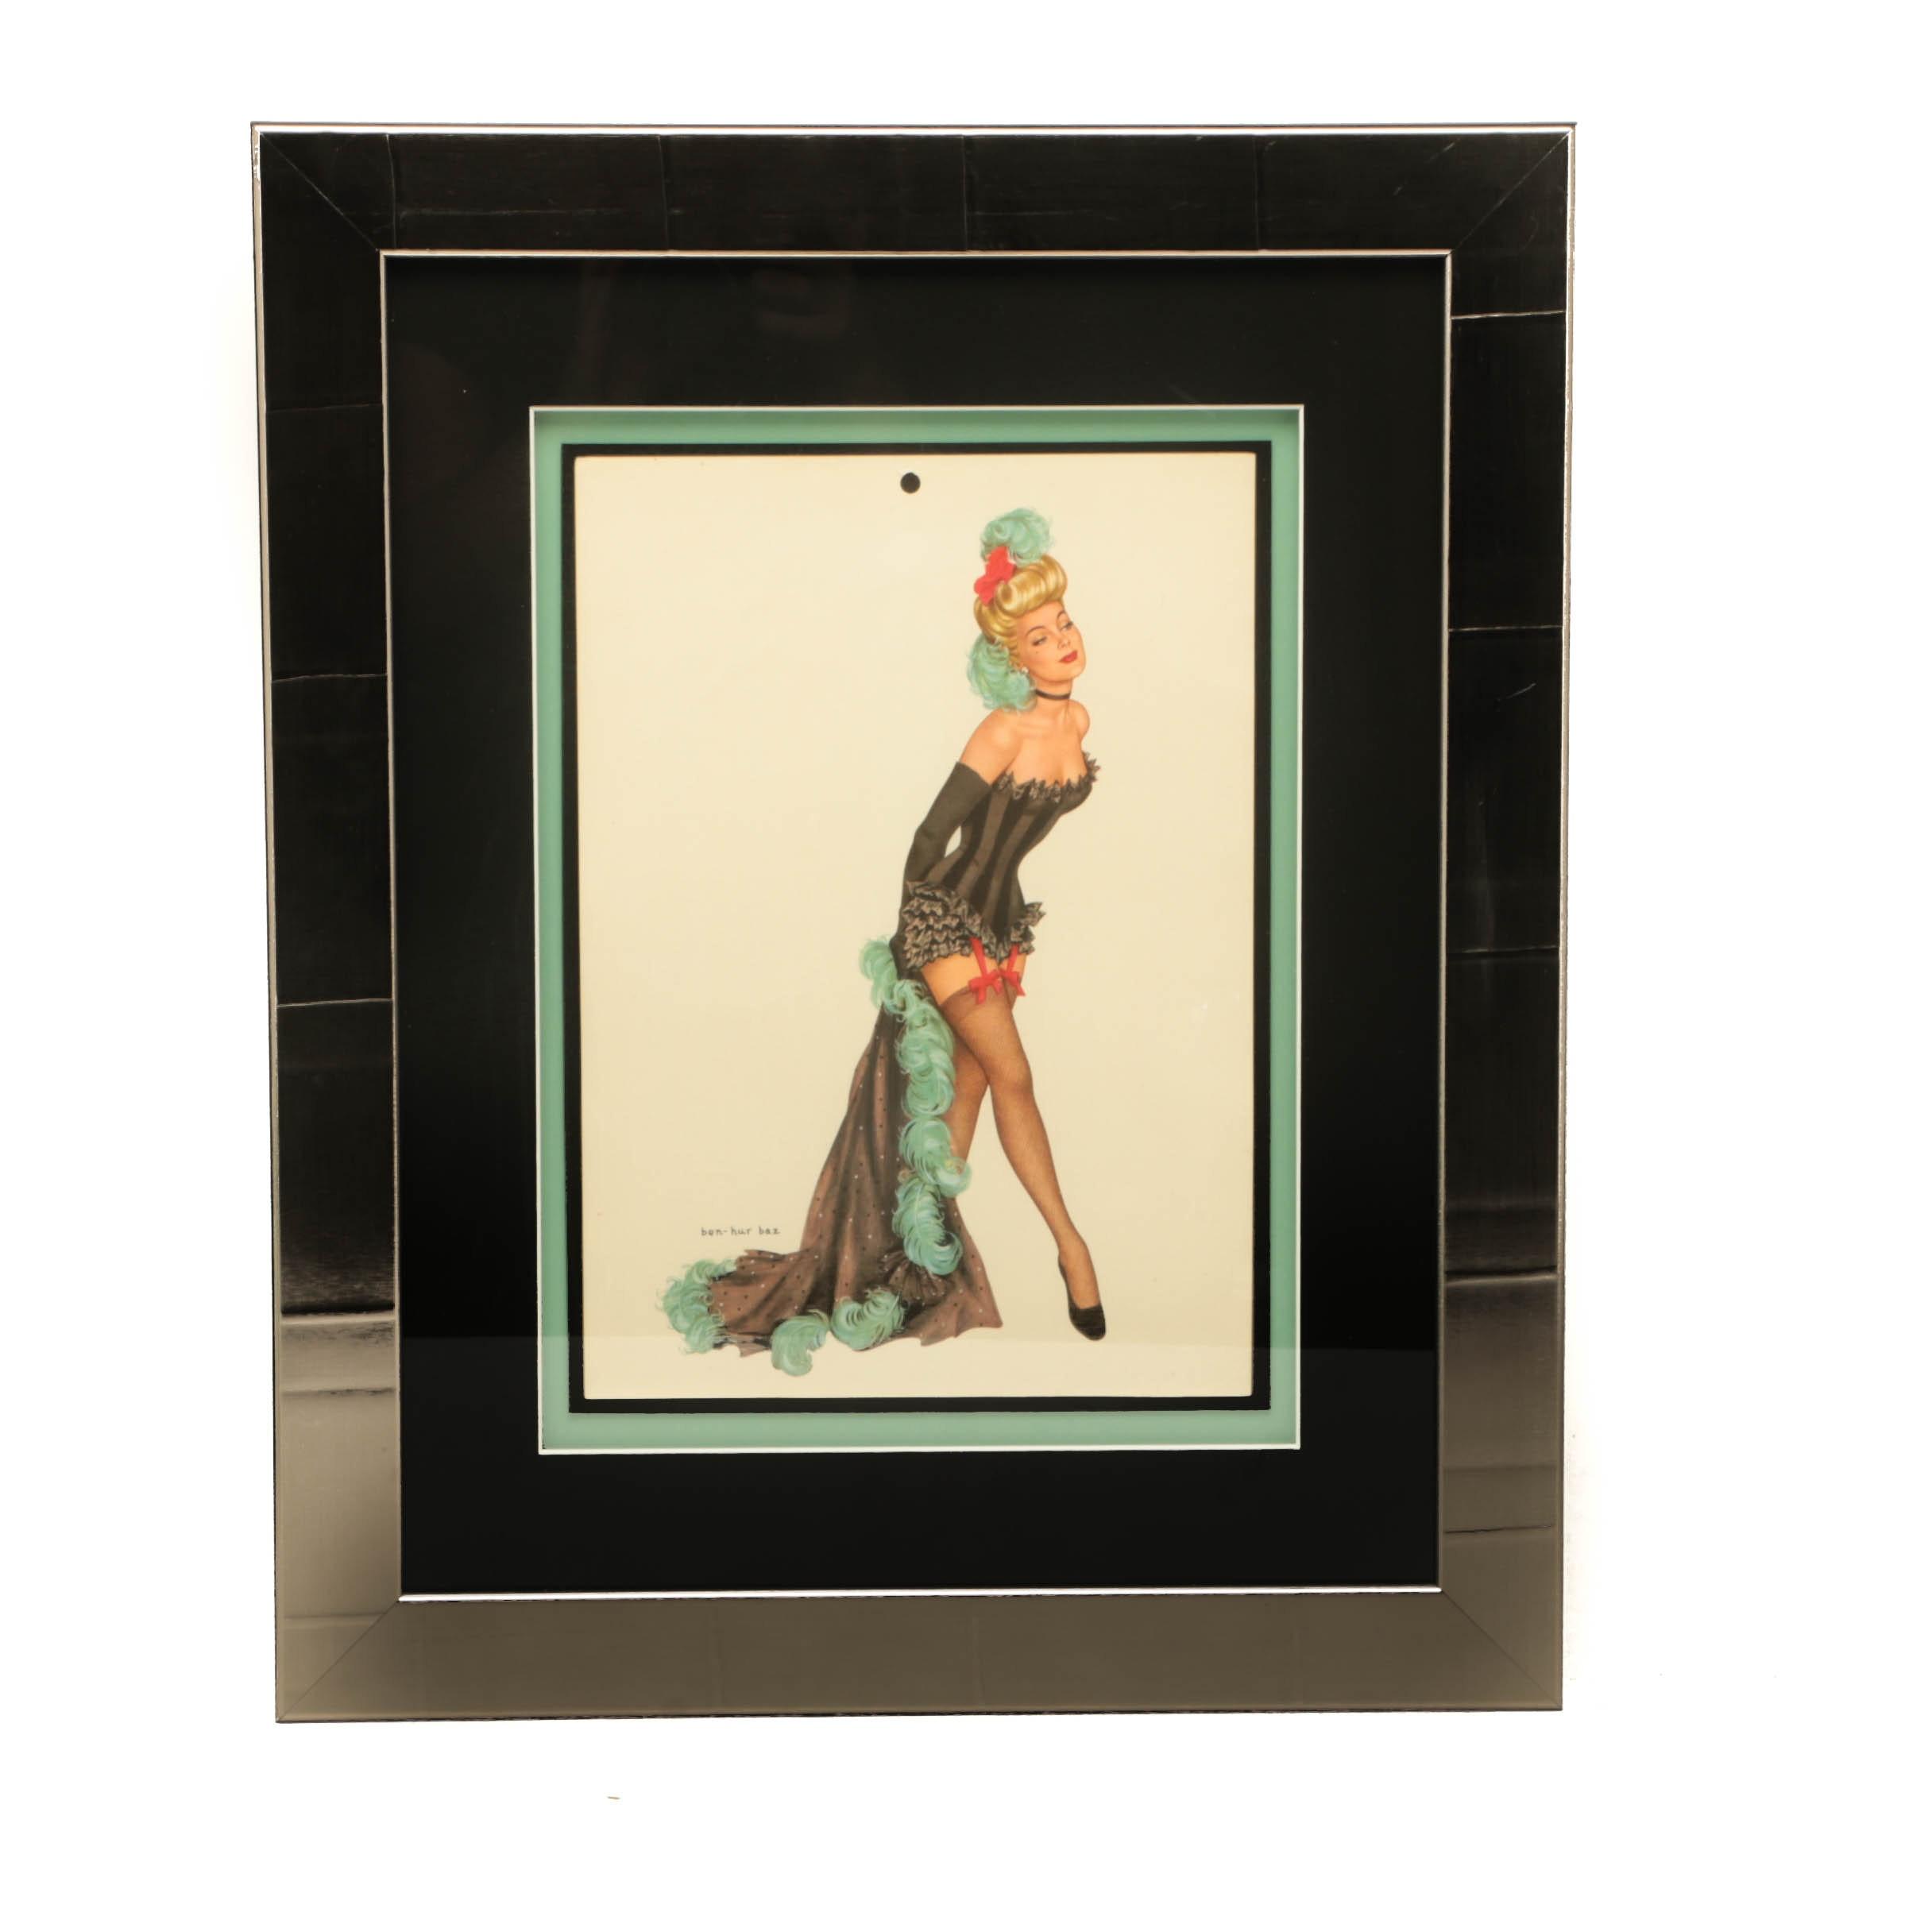 Vintage Offset Lithograph Print of Pinup Girl after Ben-Hur Baz